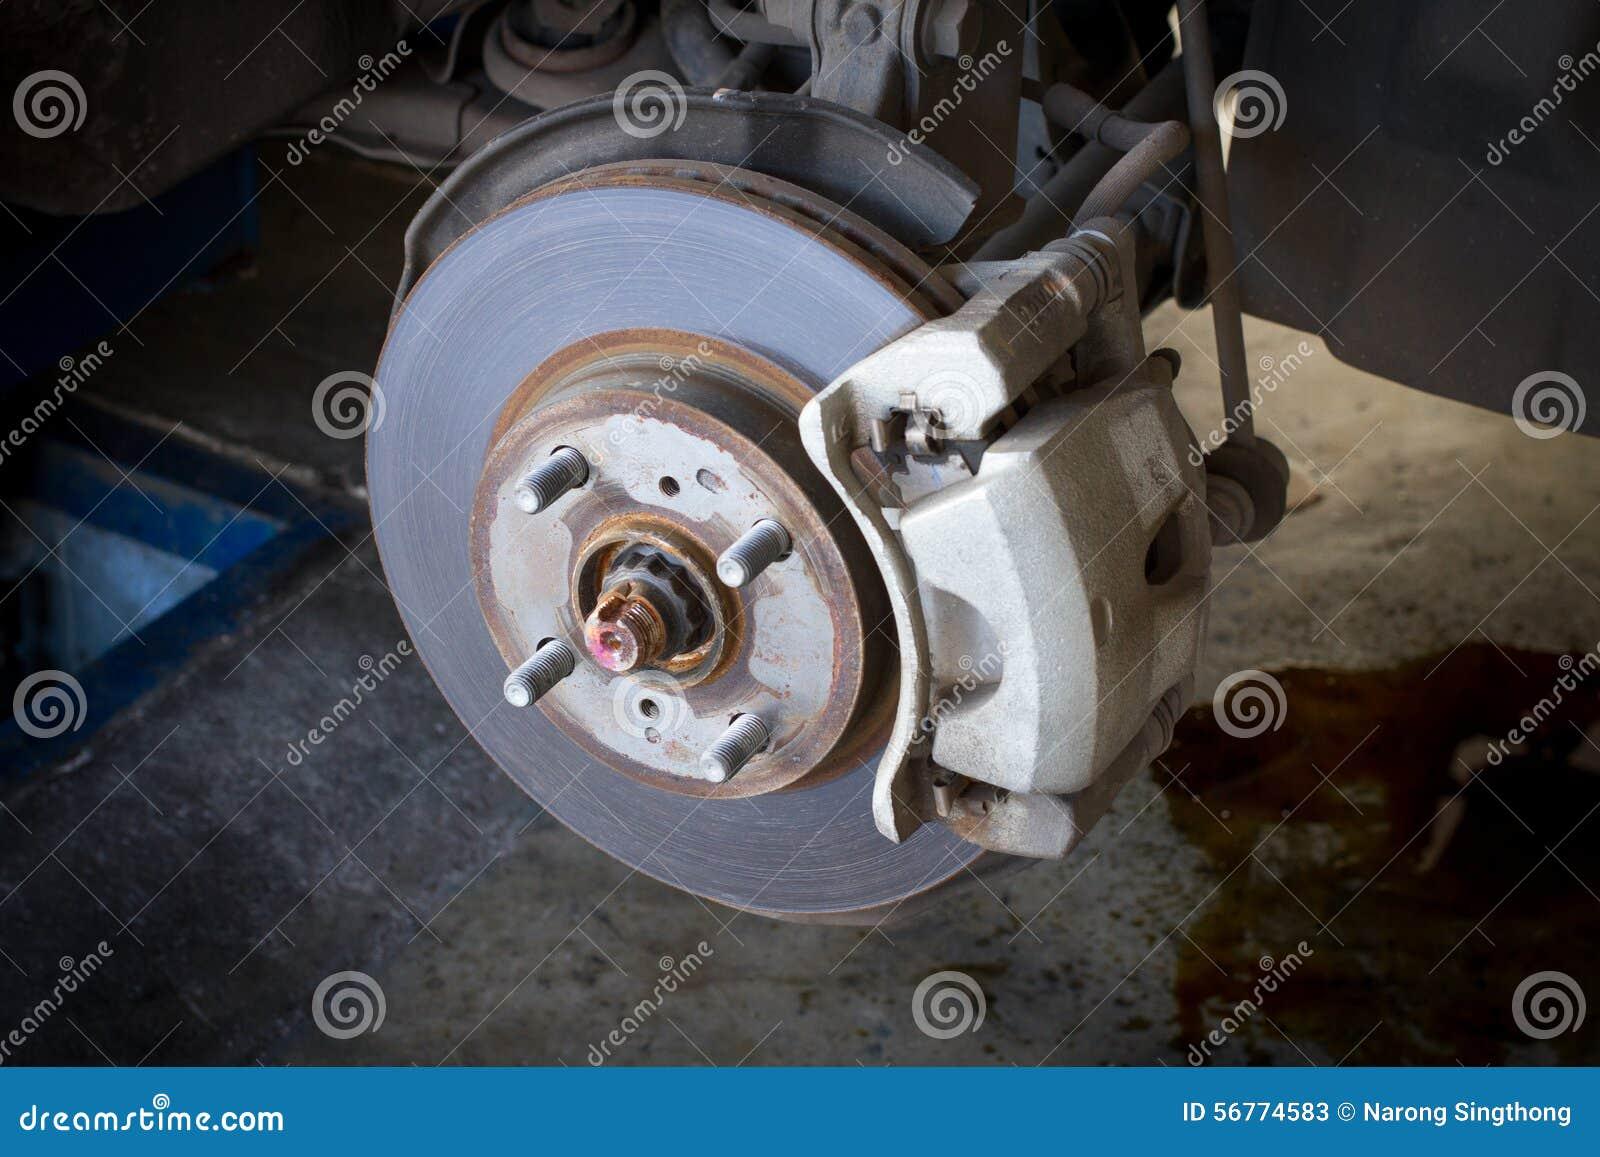 Car Brake Test : Front disk brake assembly on a car stock image of